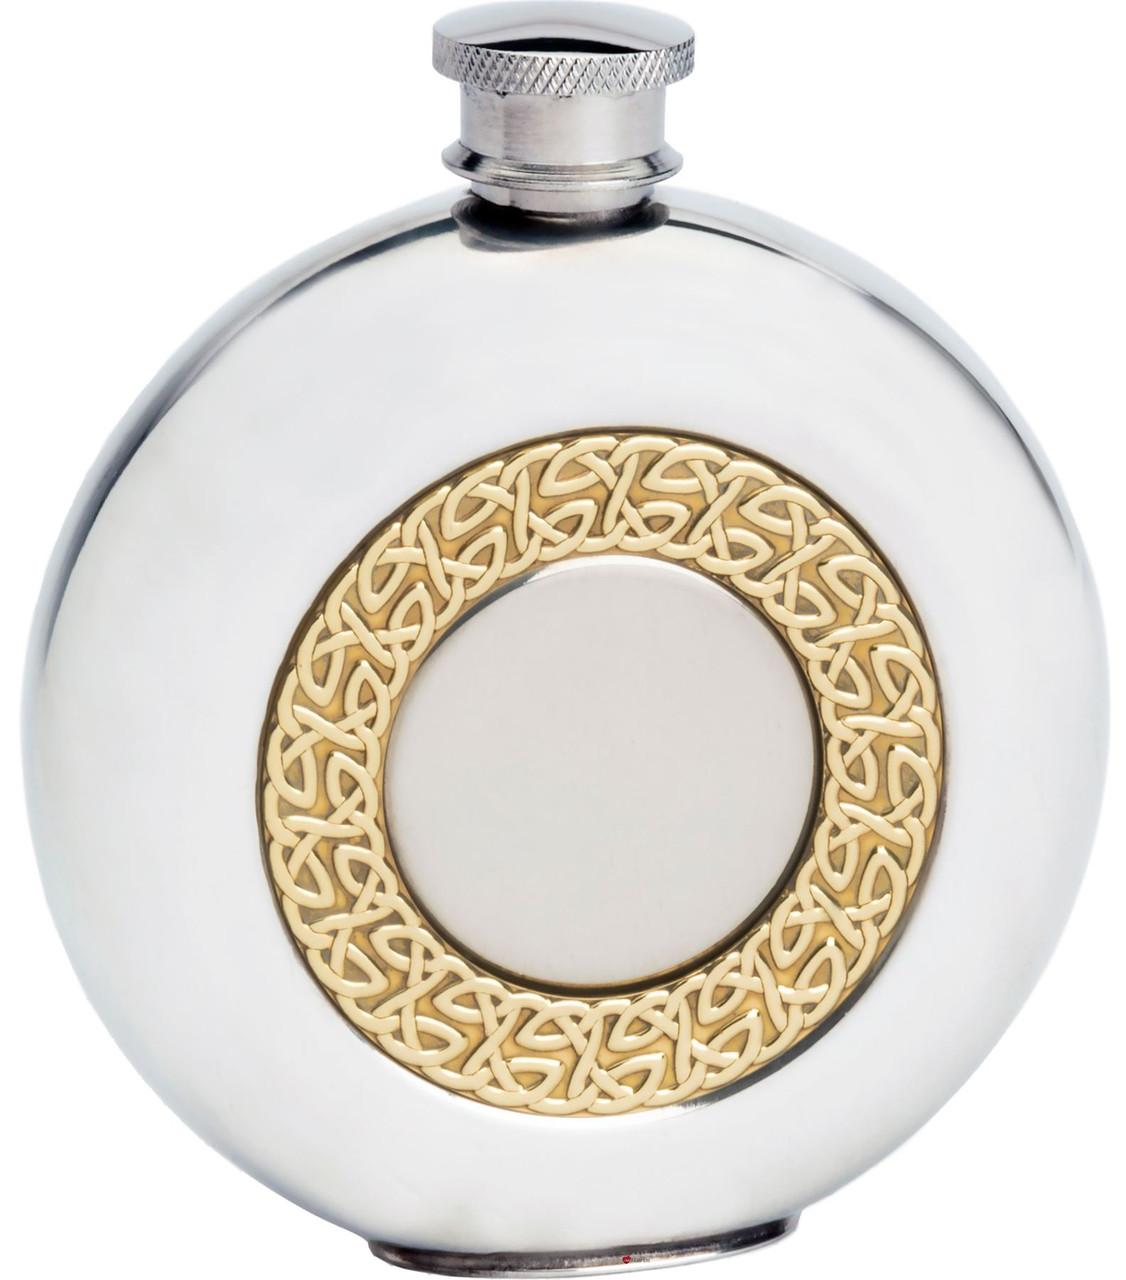 Pewter /& Brass Hip Flask Celtic Free Engraving